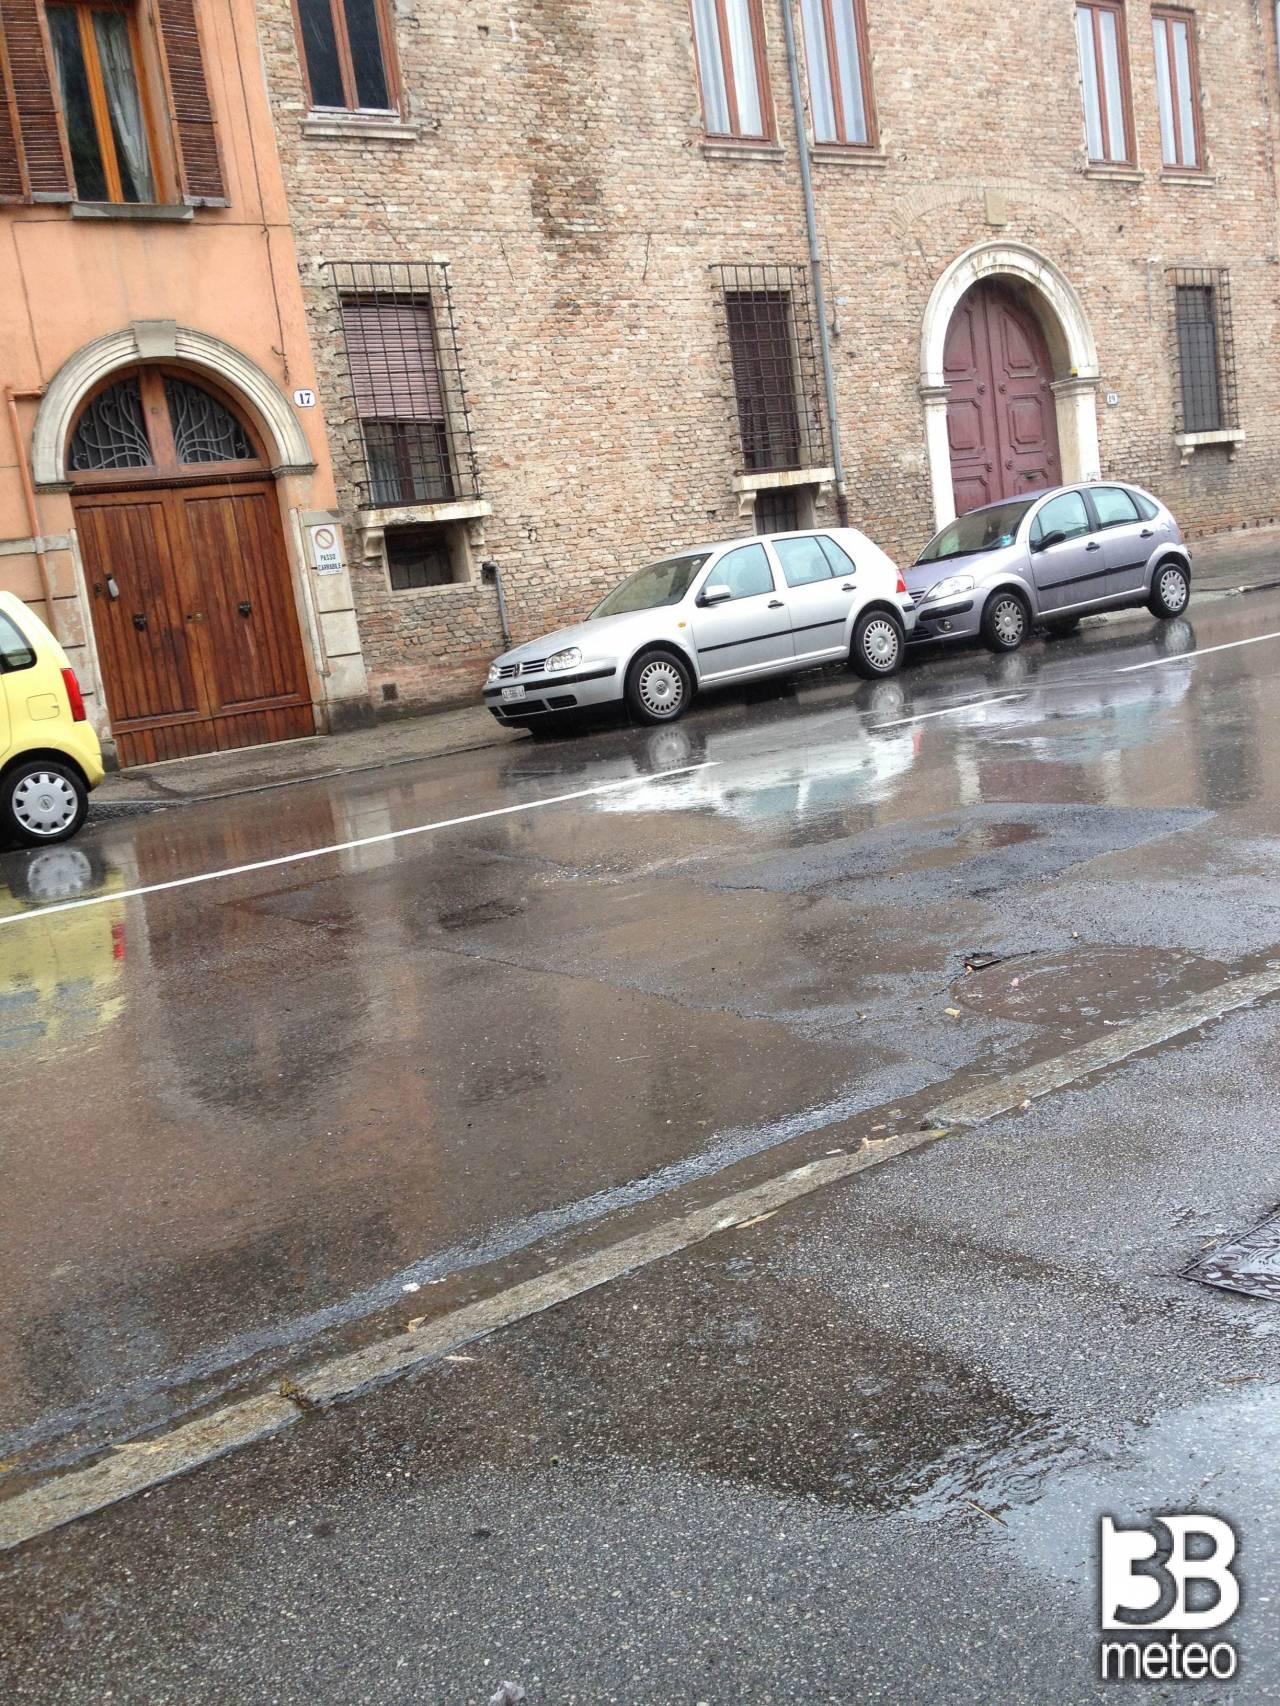 Meteo Ferrara: martedì piogge, poi molte nubi - 3bmeteo